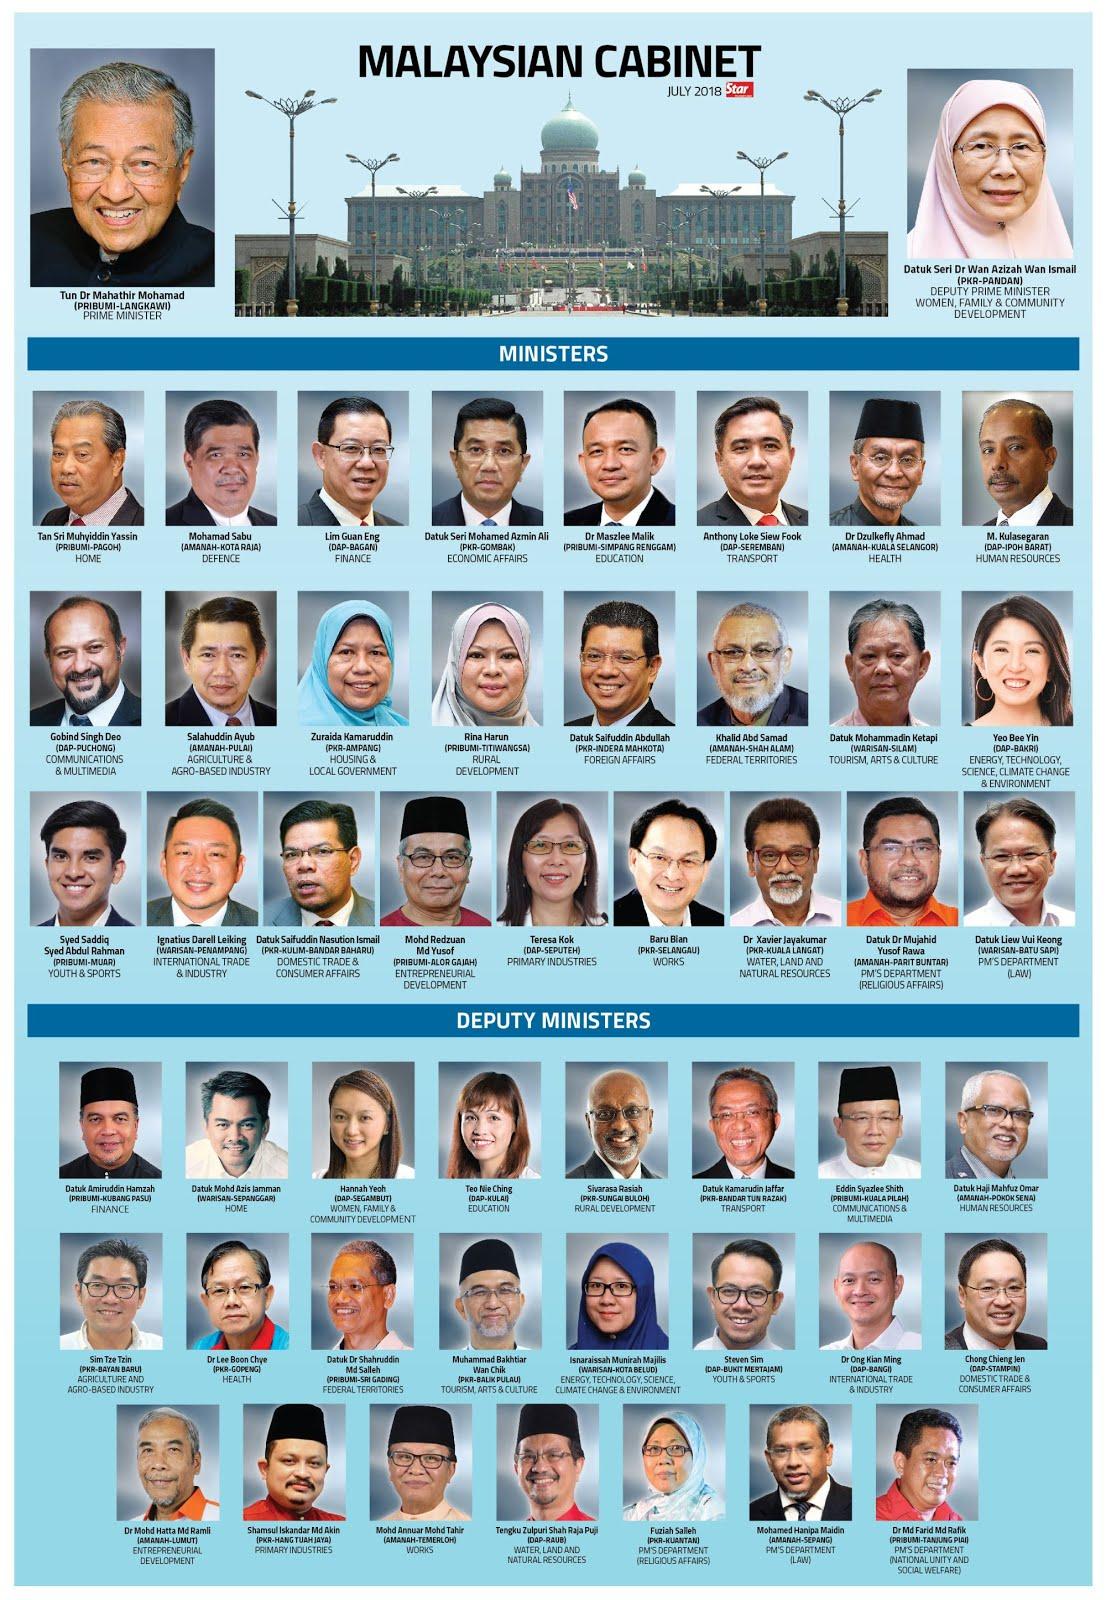 Cabinet Pakatan Harapan Malaysia 2018